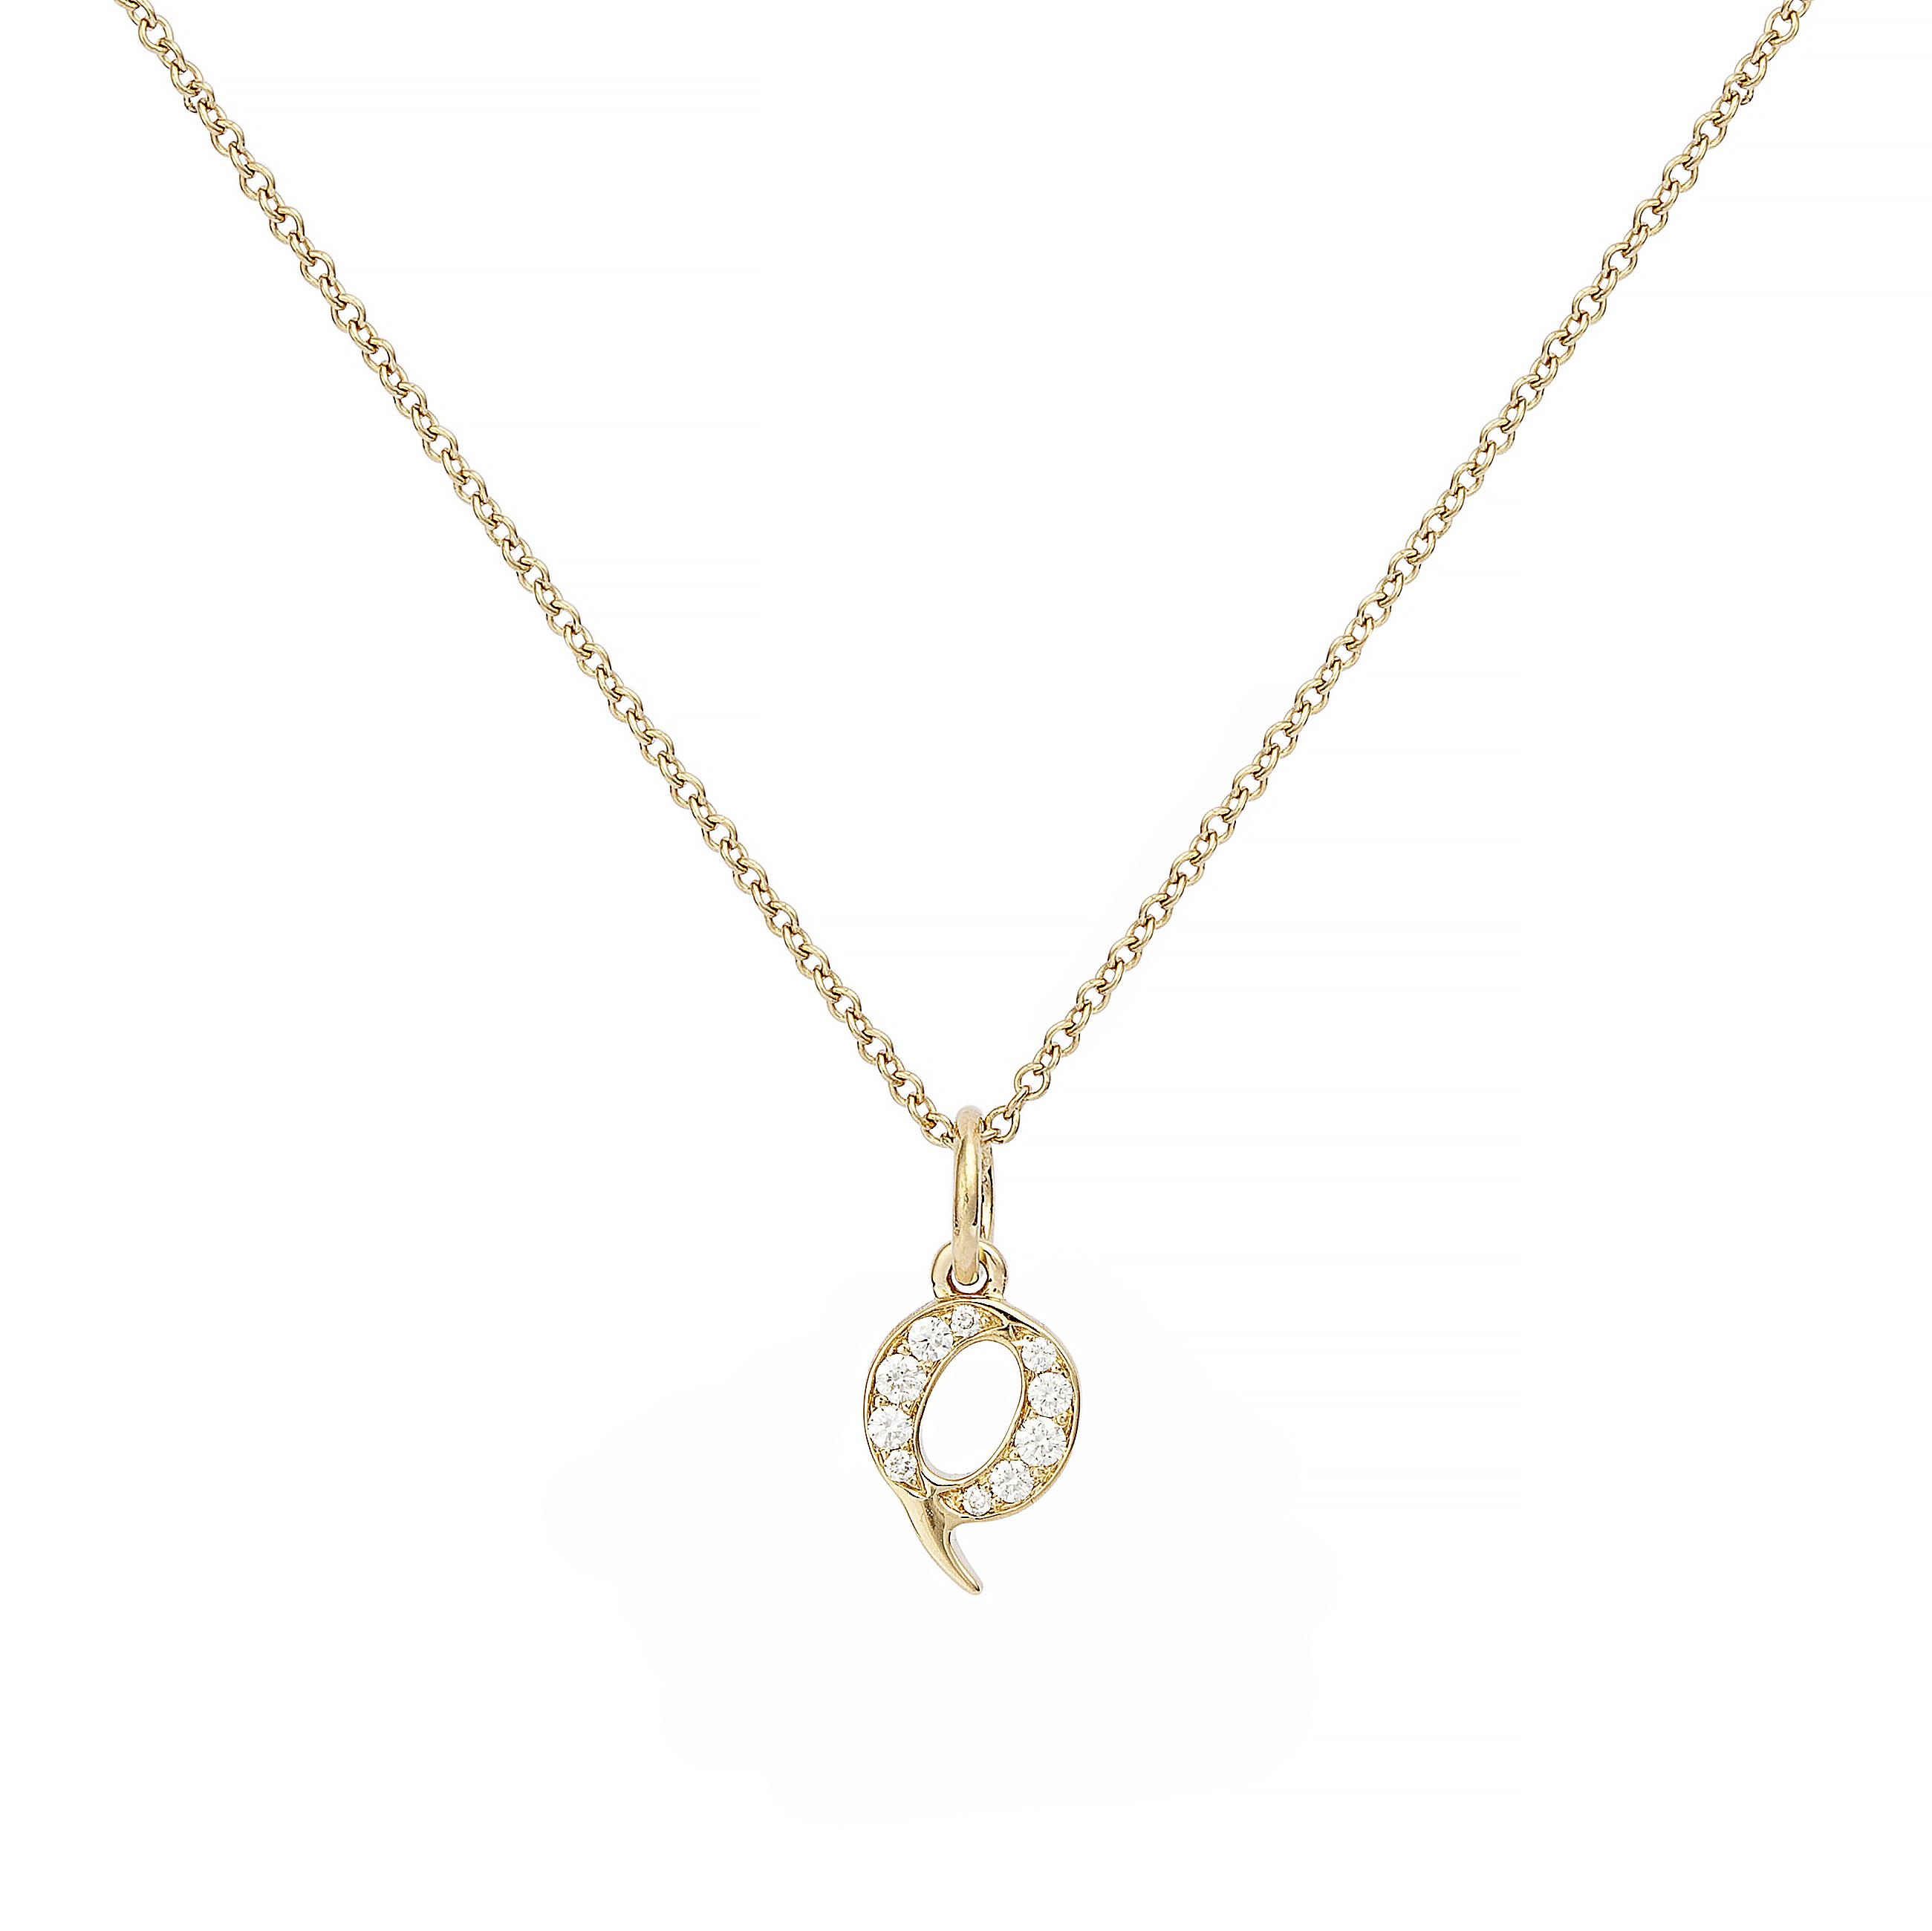 : - Love Letter 18 K guld & Diamanter – Q